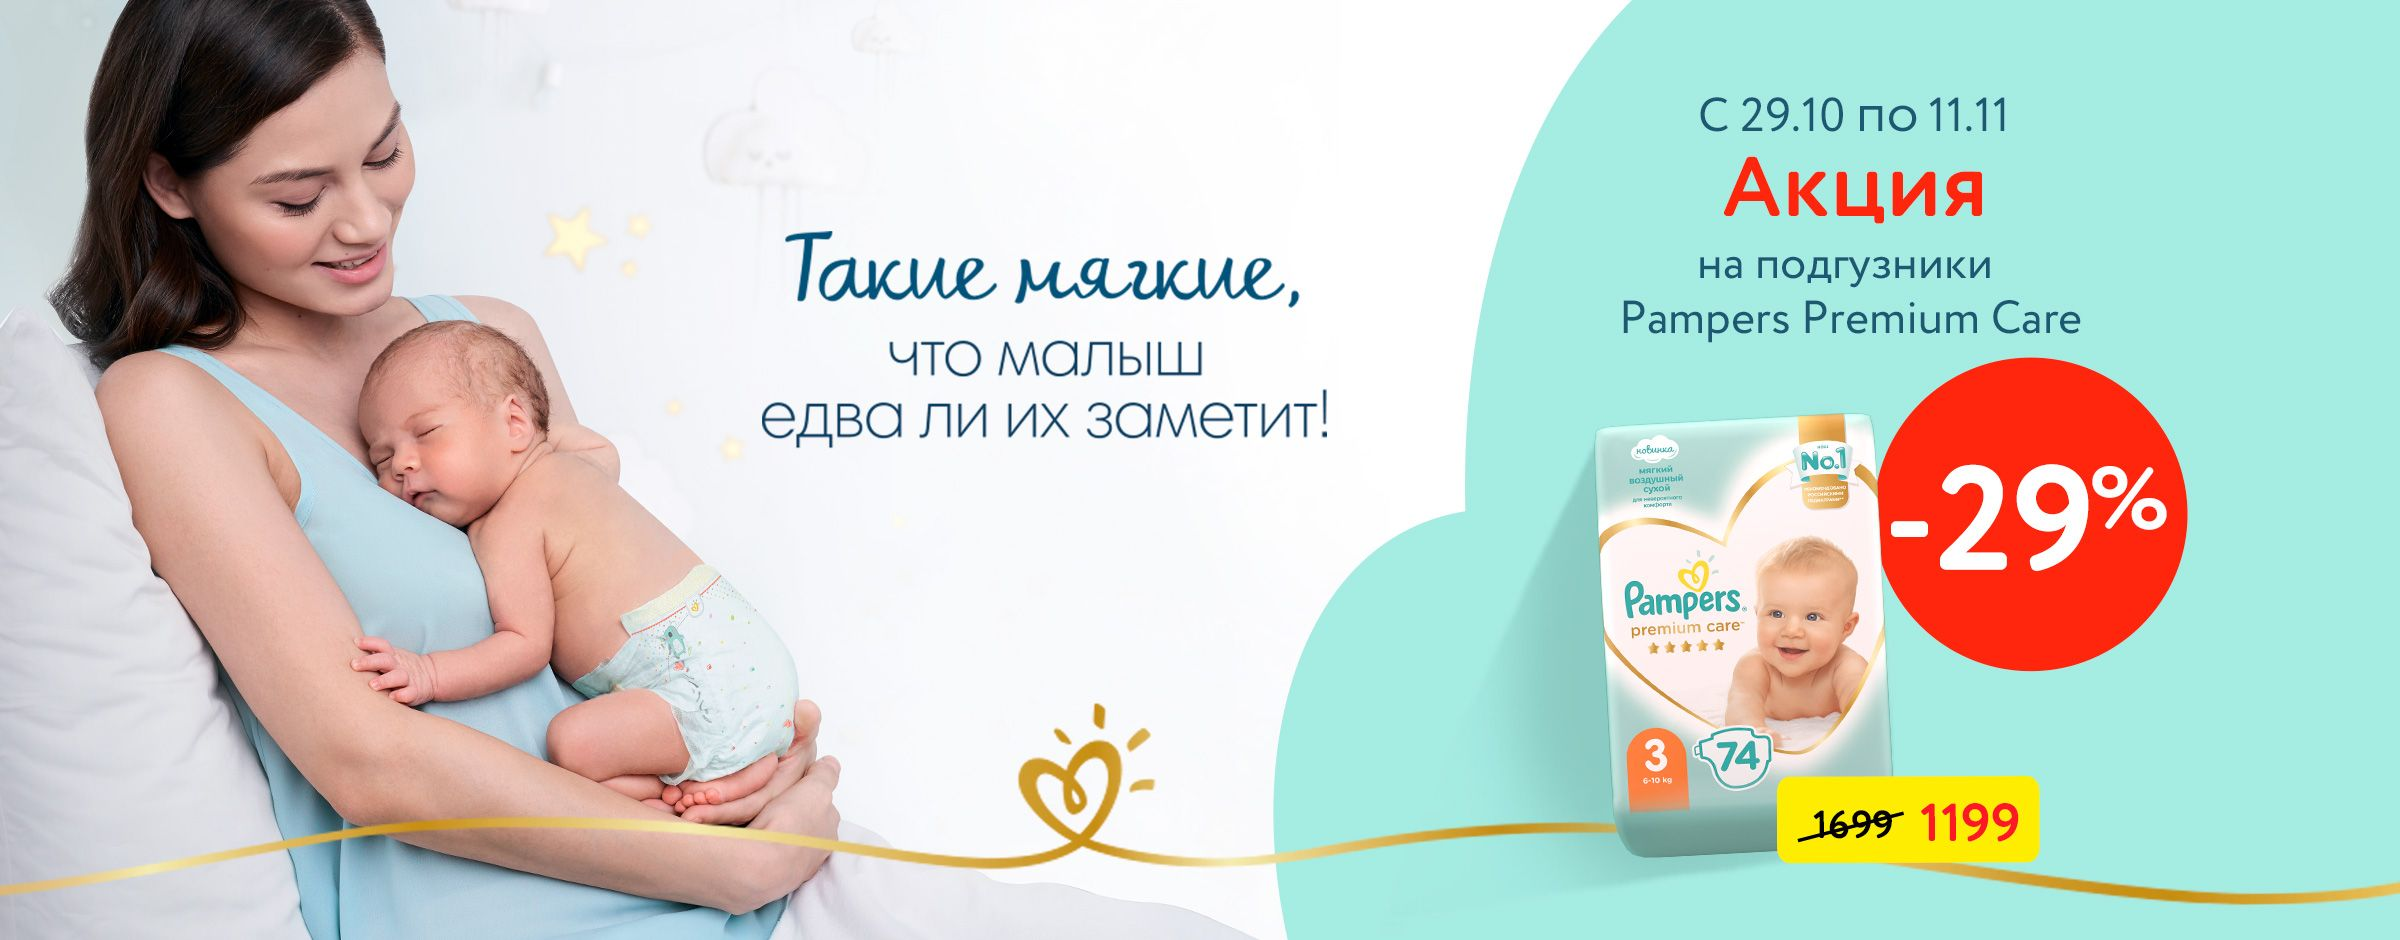 29% на подгузники Pampers Premium care Подгузники